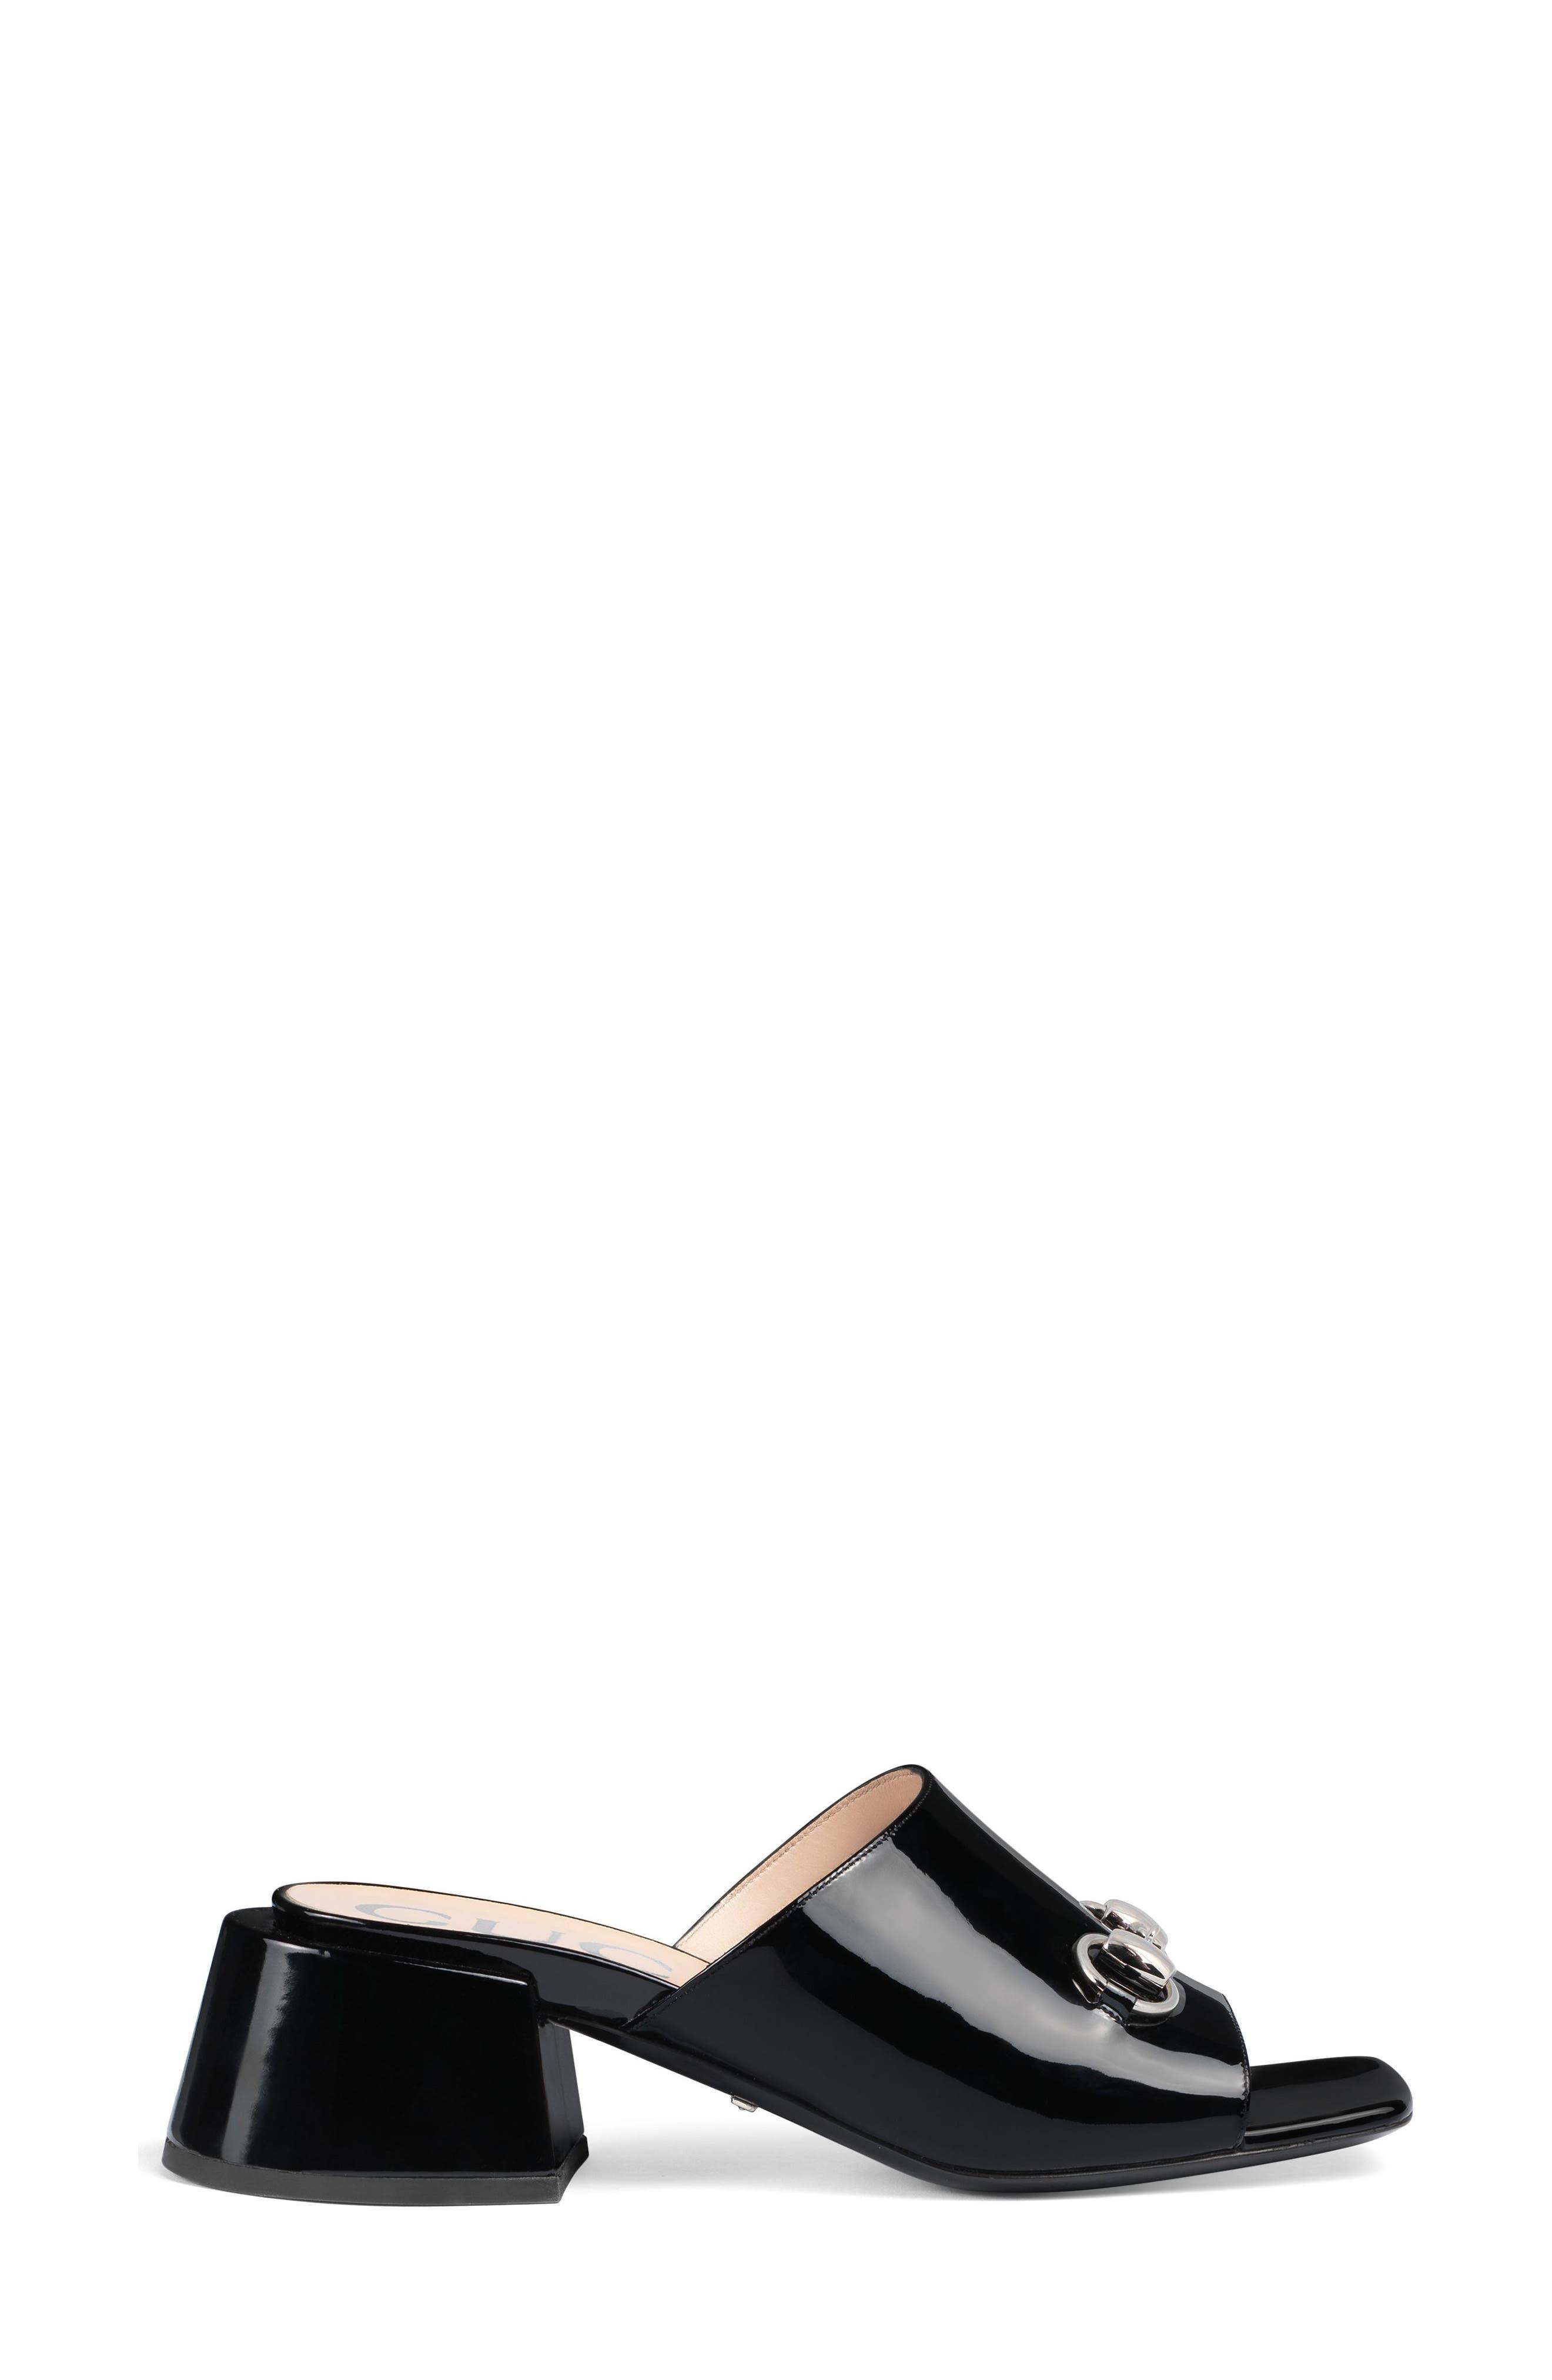 GUCCI, Lexi Slide Sandal, Alternate thumbnail 2, color, BLACK